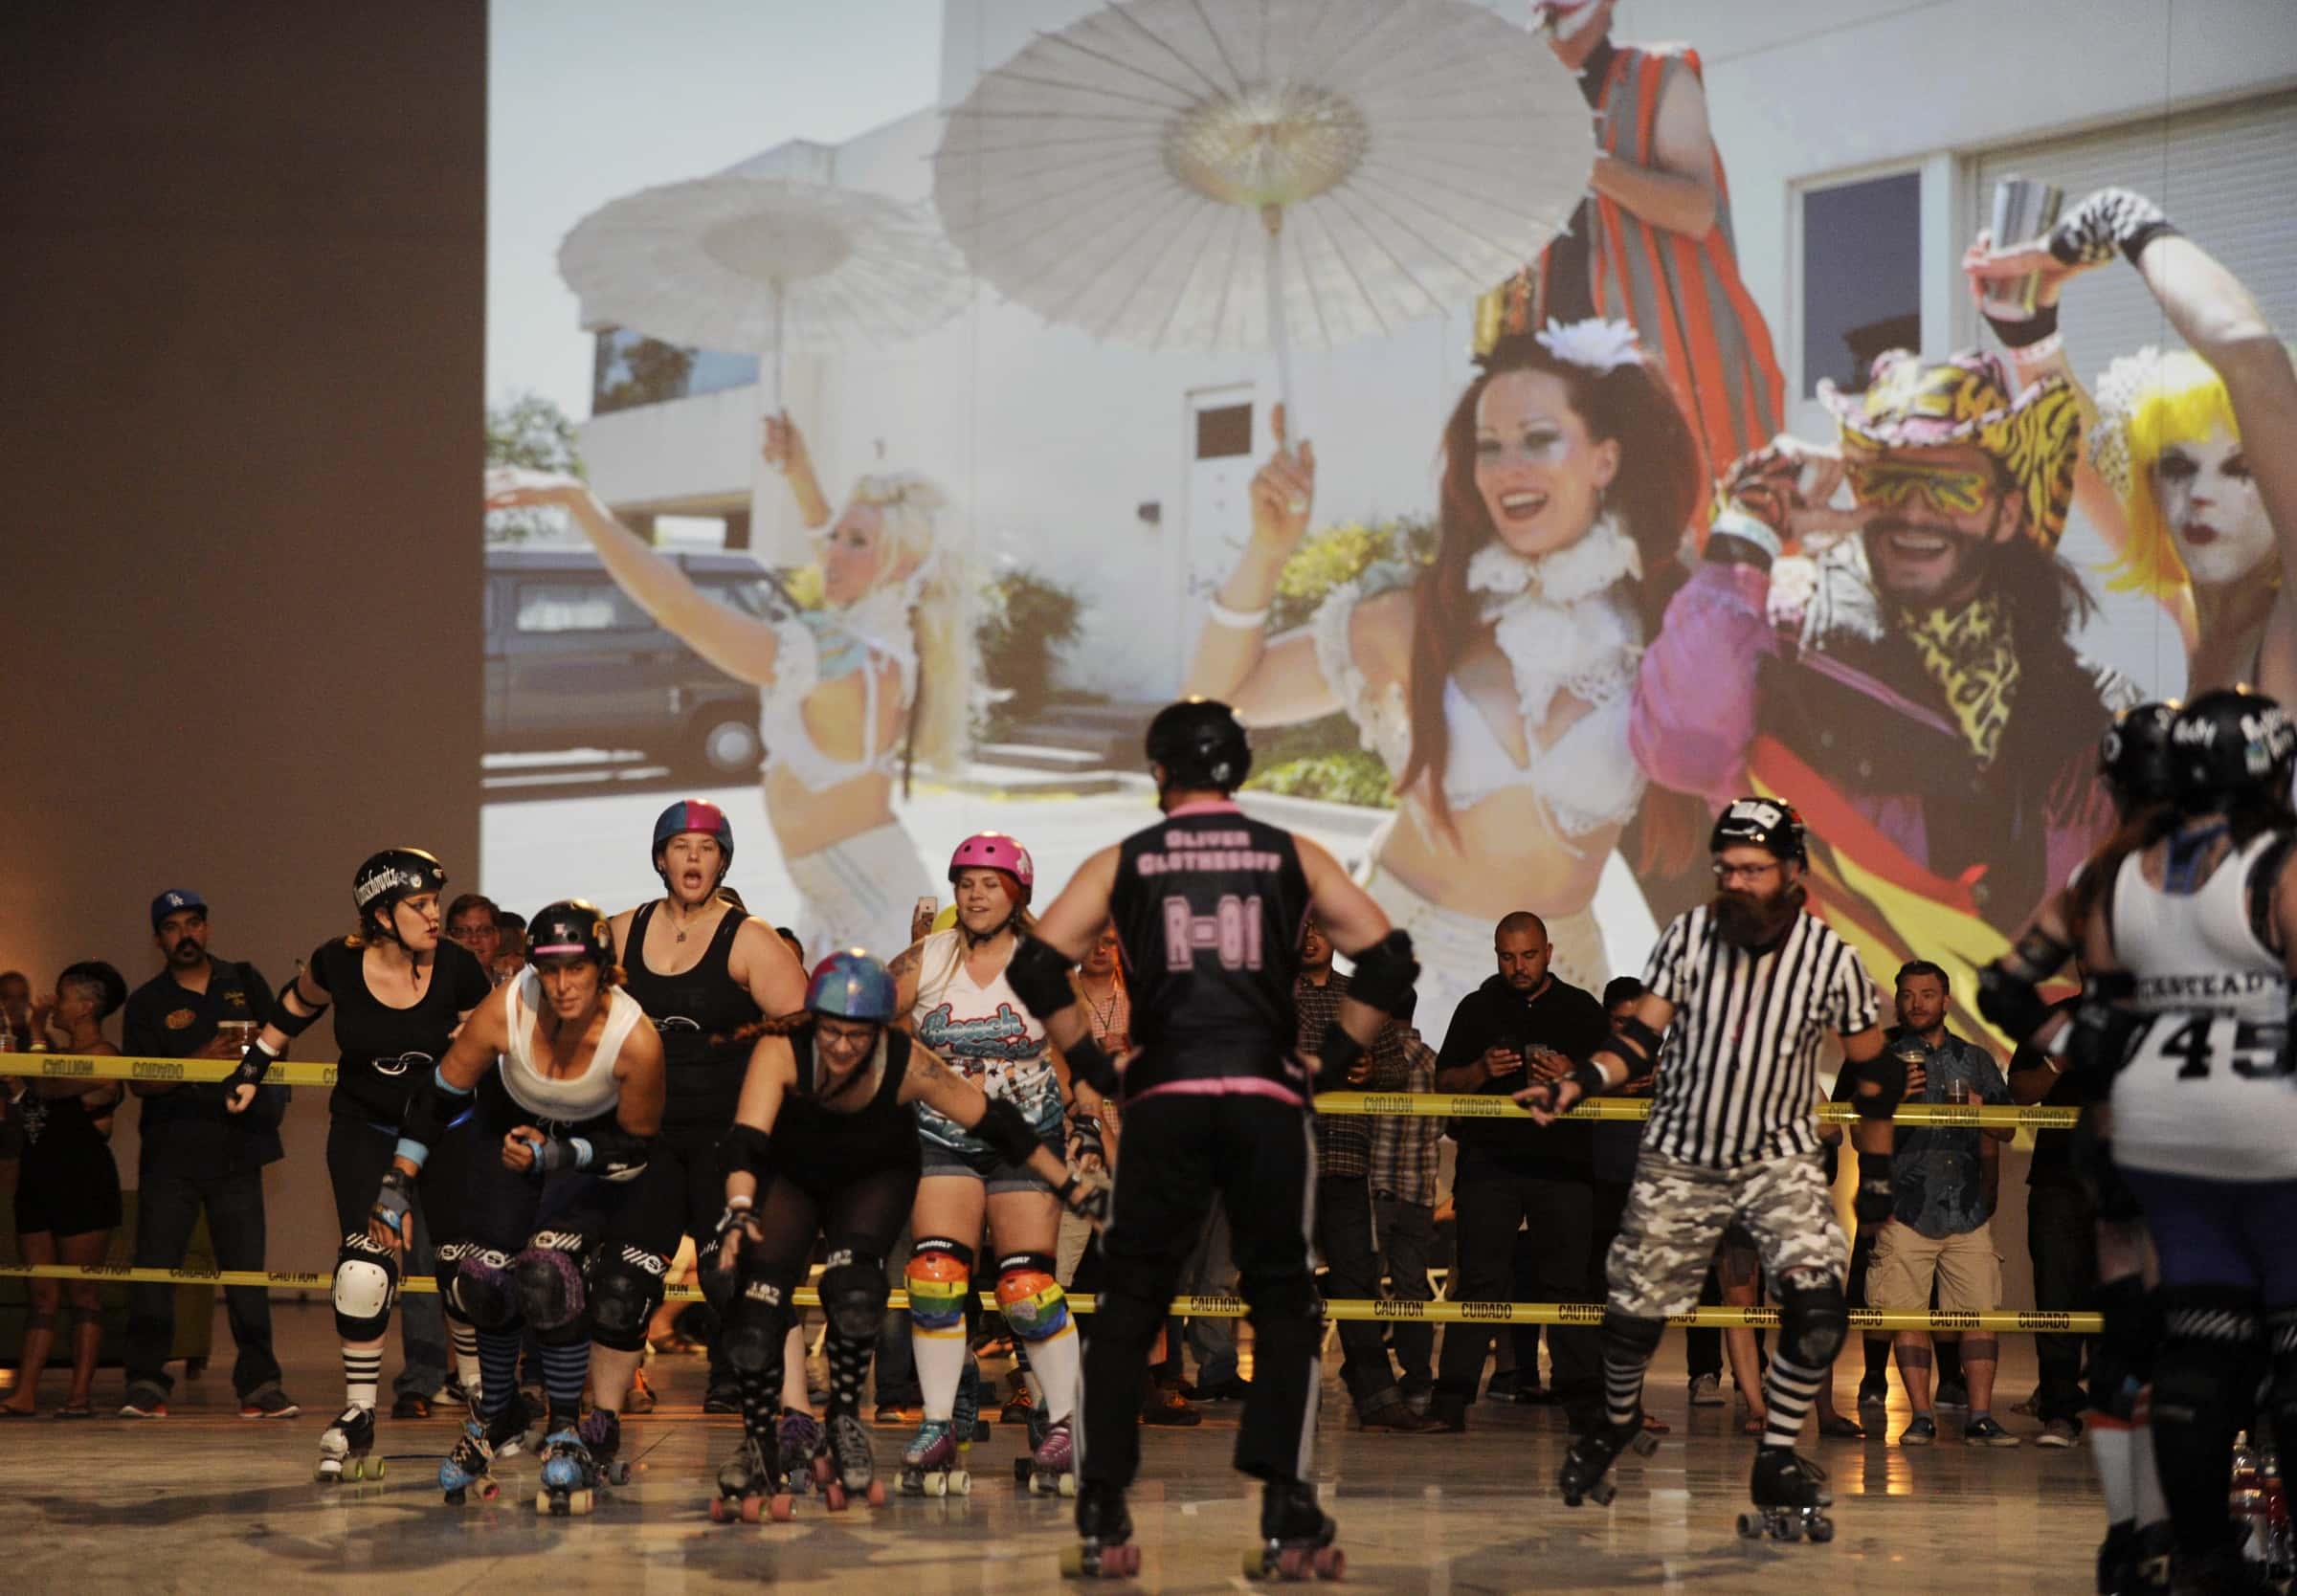 IMAGE DISTRIBUTED FOR LAGUNITAS BREWING COMPANY - Roller Derby girls meet Lagunitas Beer Circus as the Lagunitas Sneaky Peek party on Tuesday, April 19, 2016, in Azusa, Calif. Lagunitas/Azusa will open in 2017. (Carlos Delgado/AP Images for Lagunitas Brewing Company)